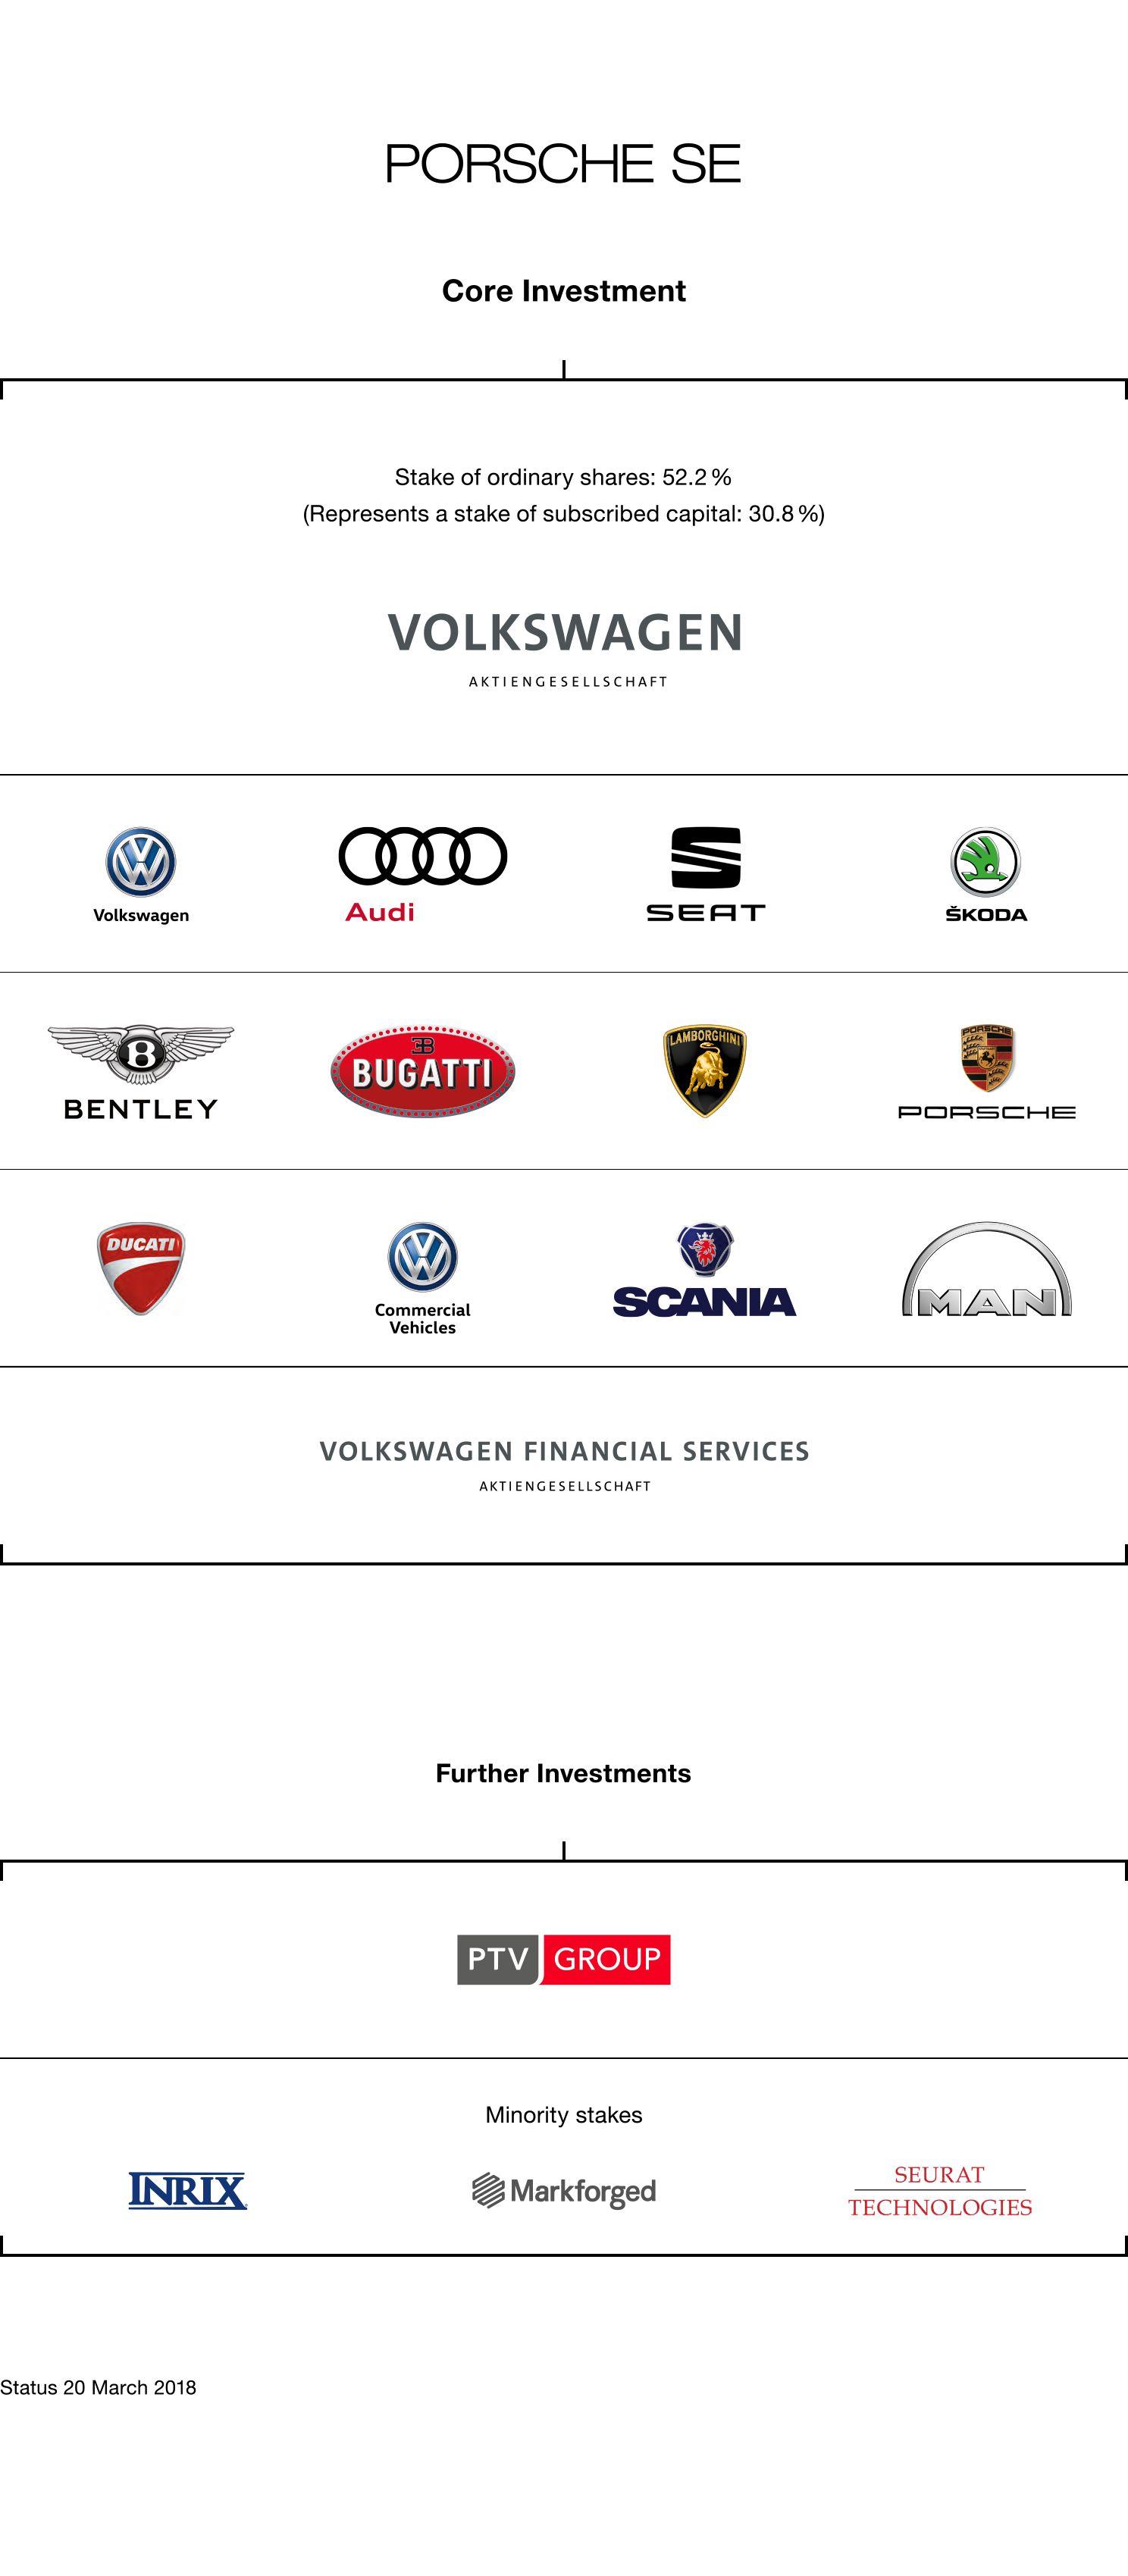 Porsche SE Holding structure